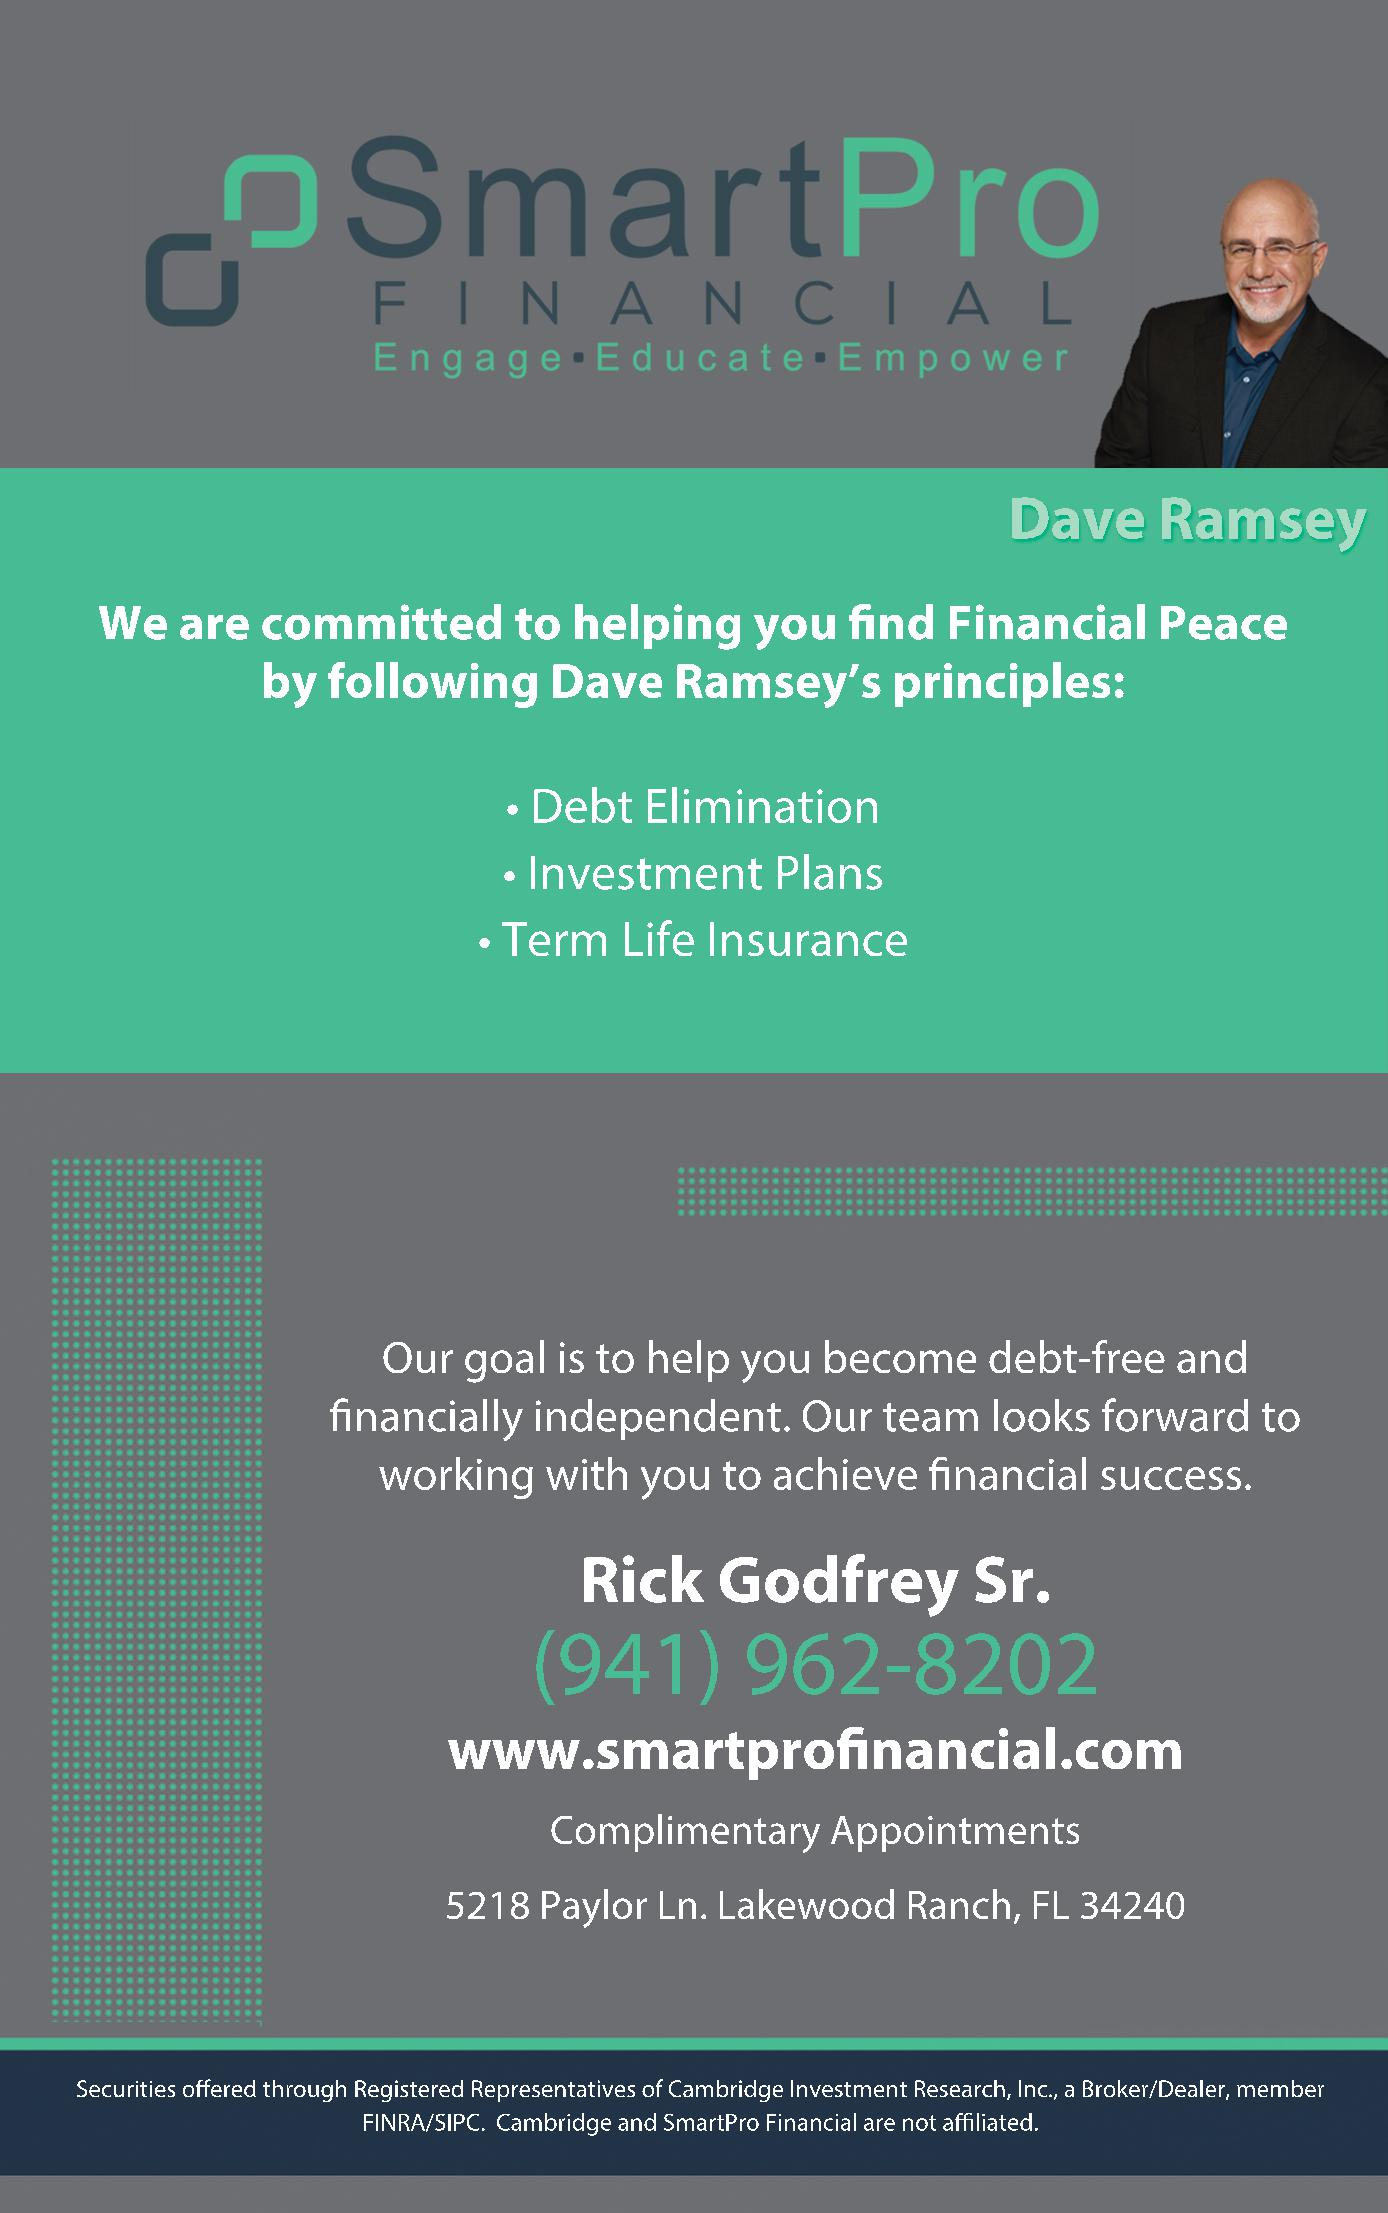 SmartPro Financial